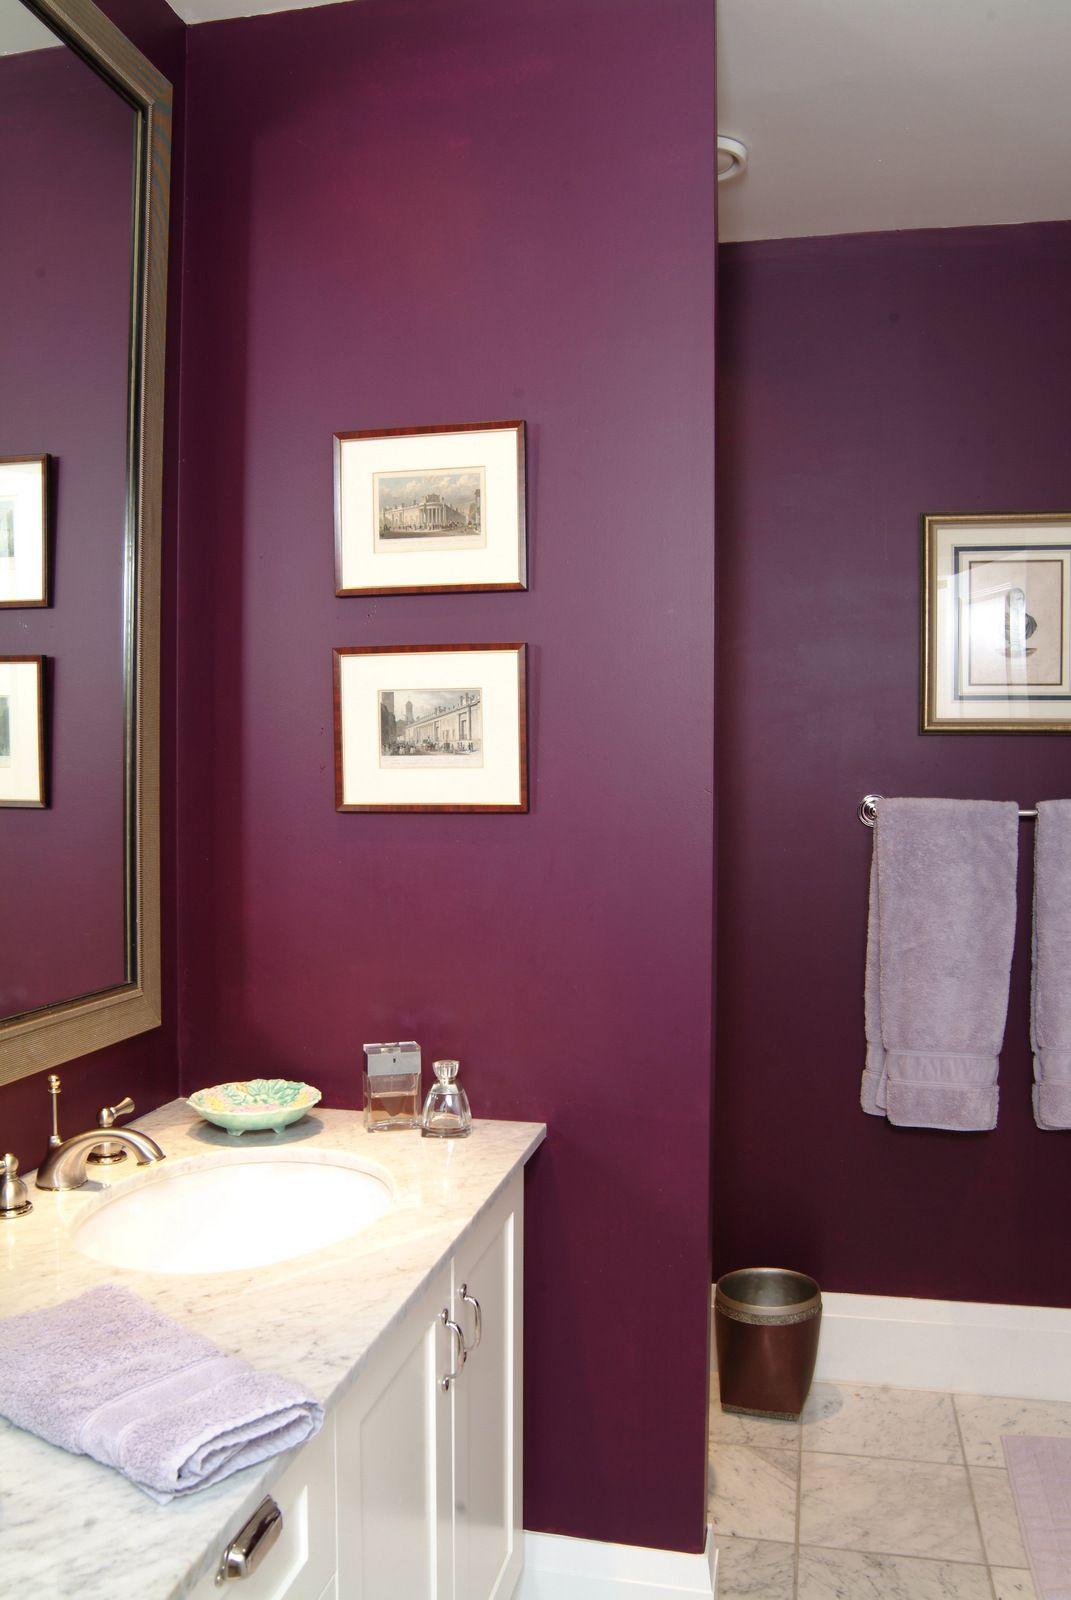 plum purple bathroom from interior design projectjane hall